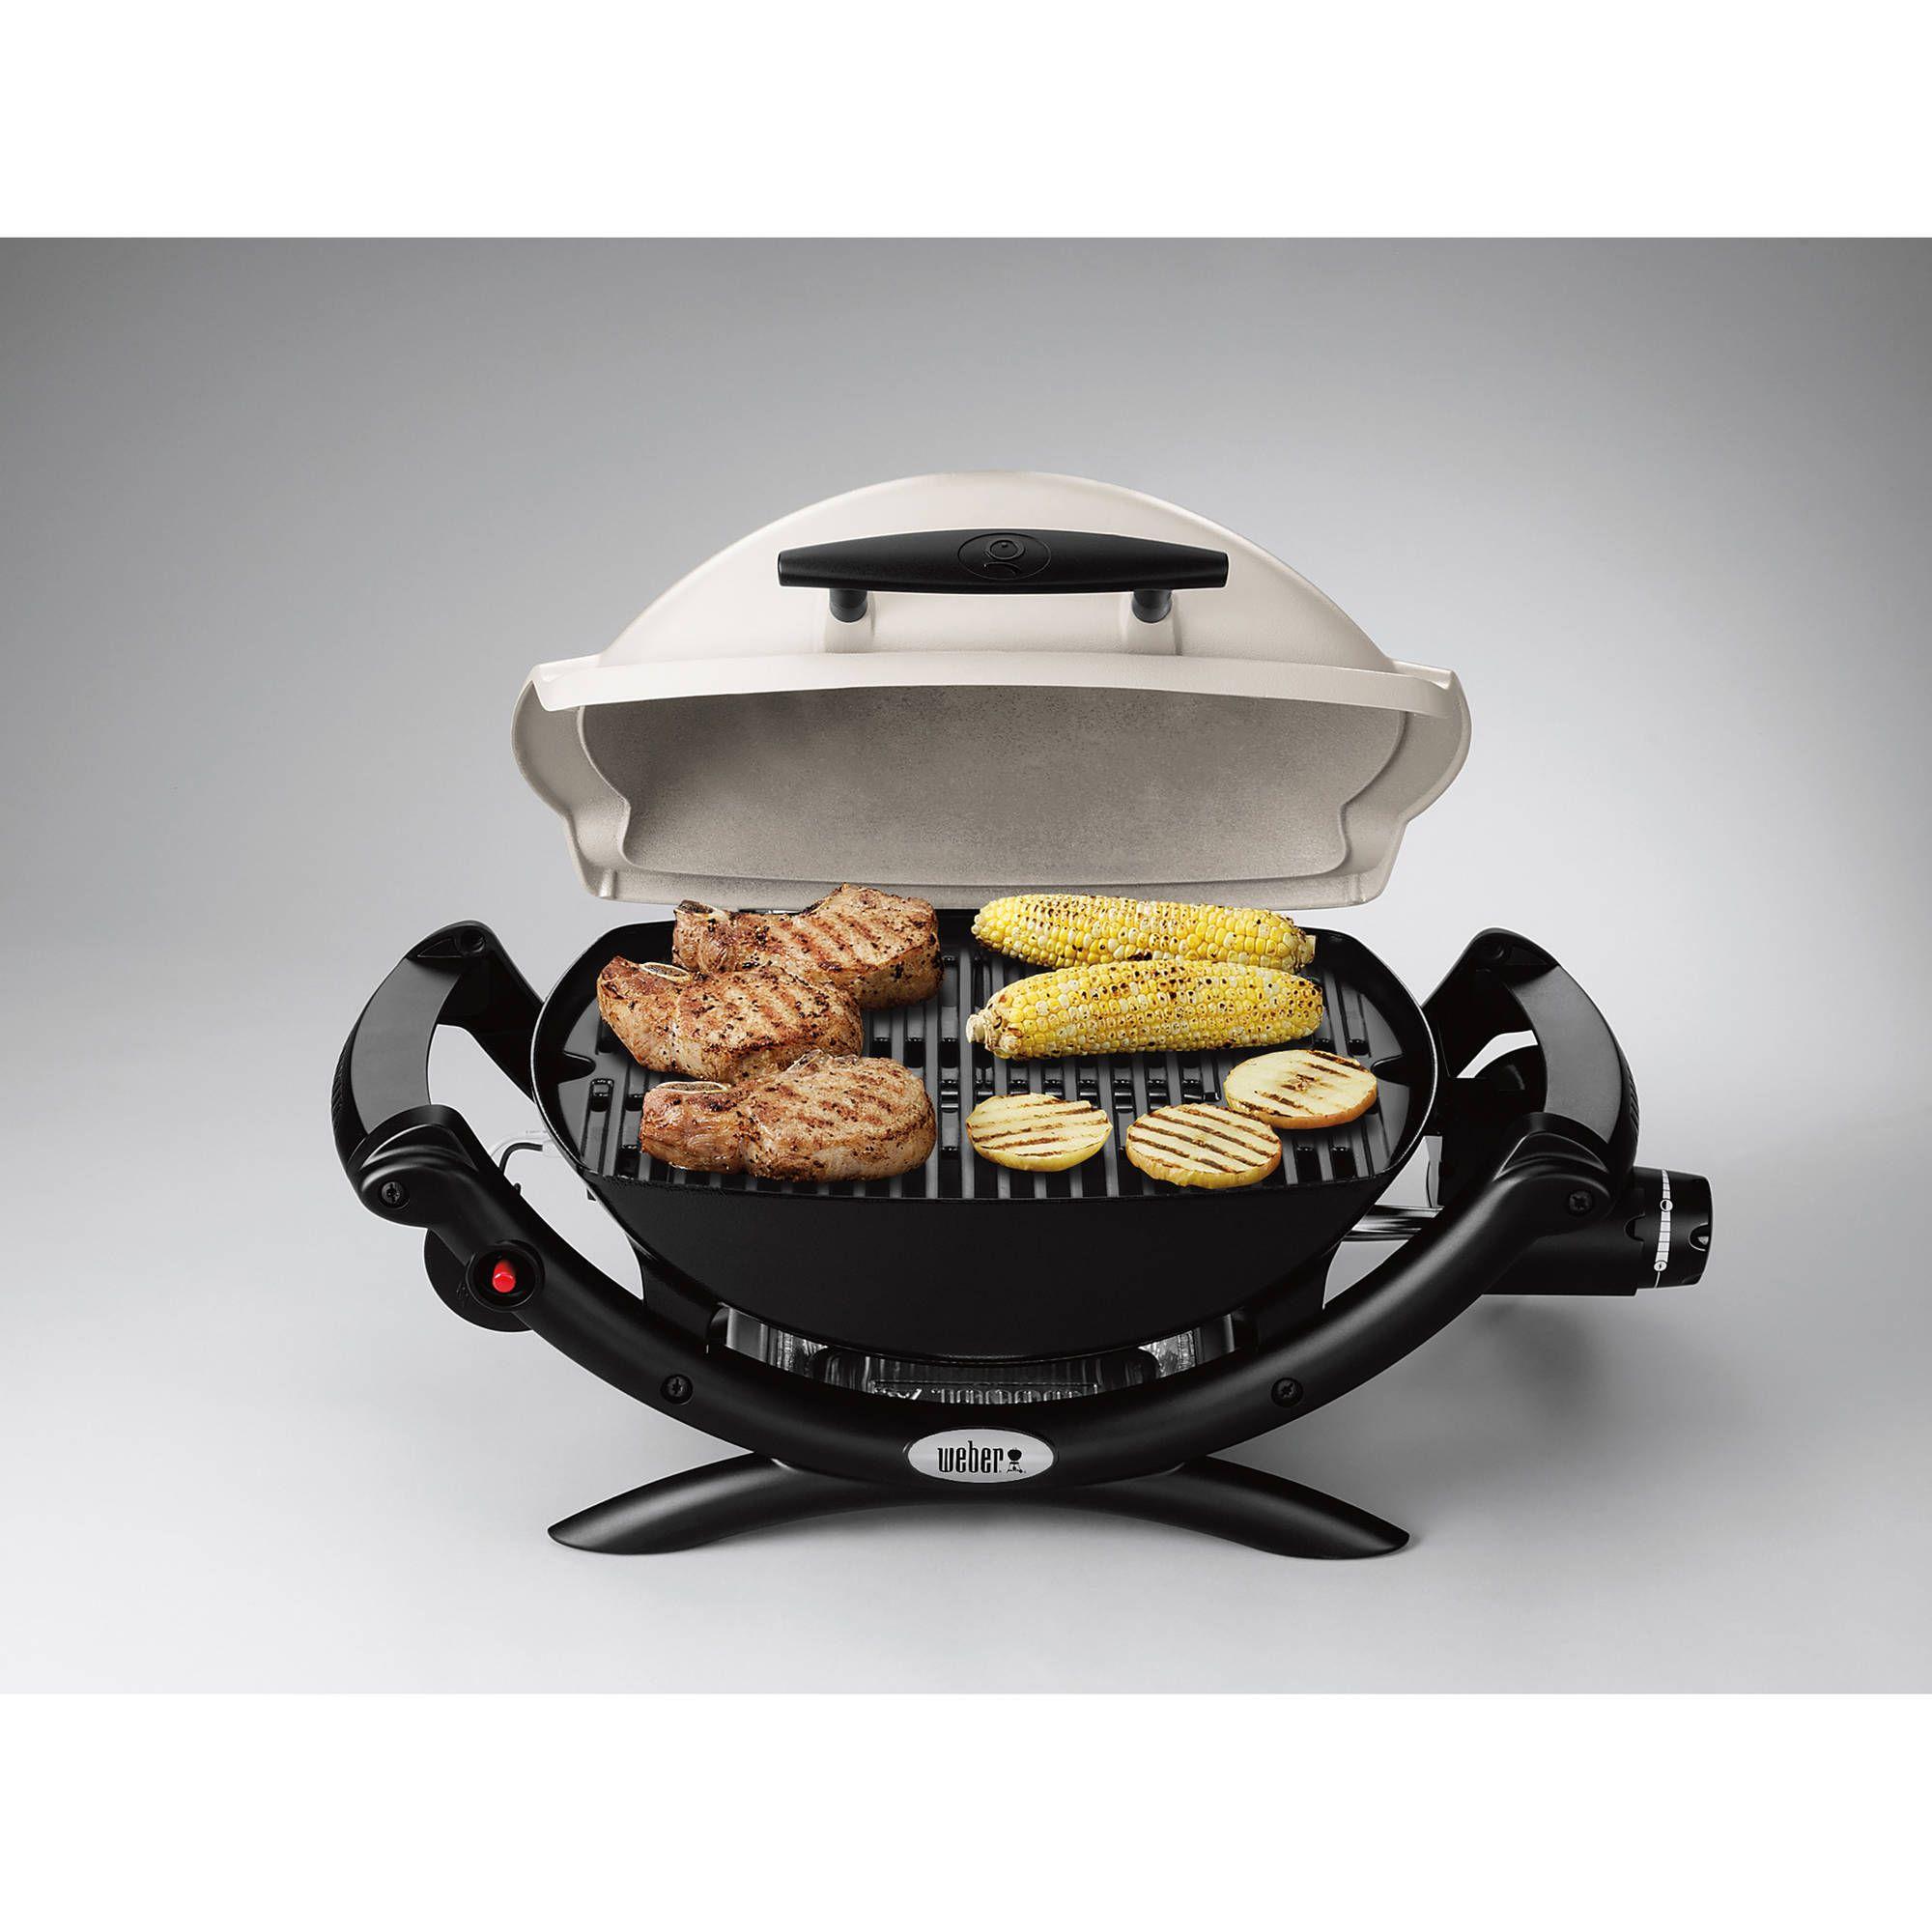 Weber Q 1000 1 Burner Portable Gas Grill Titanium Walmart Com Propane Grill Propane Gas Grill Best Small Gas Grill